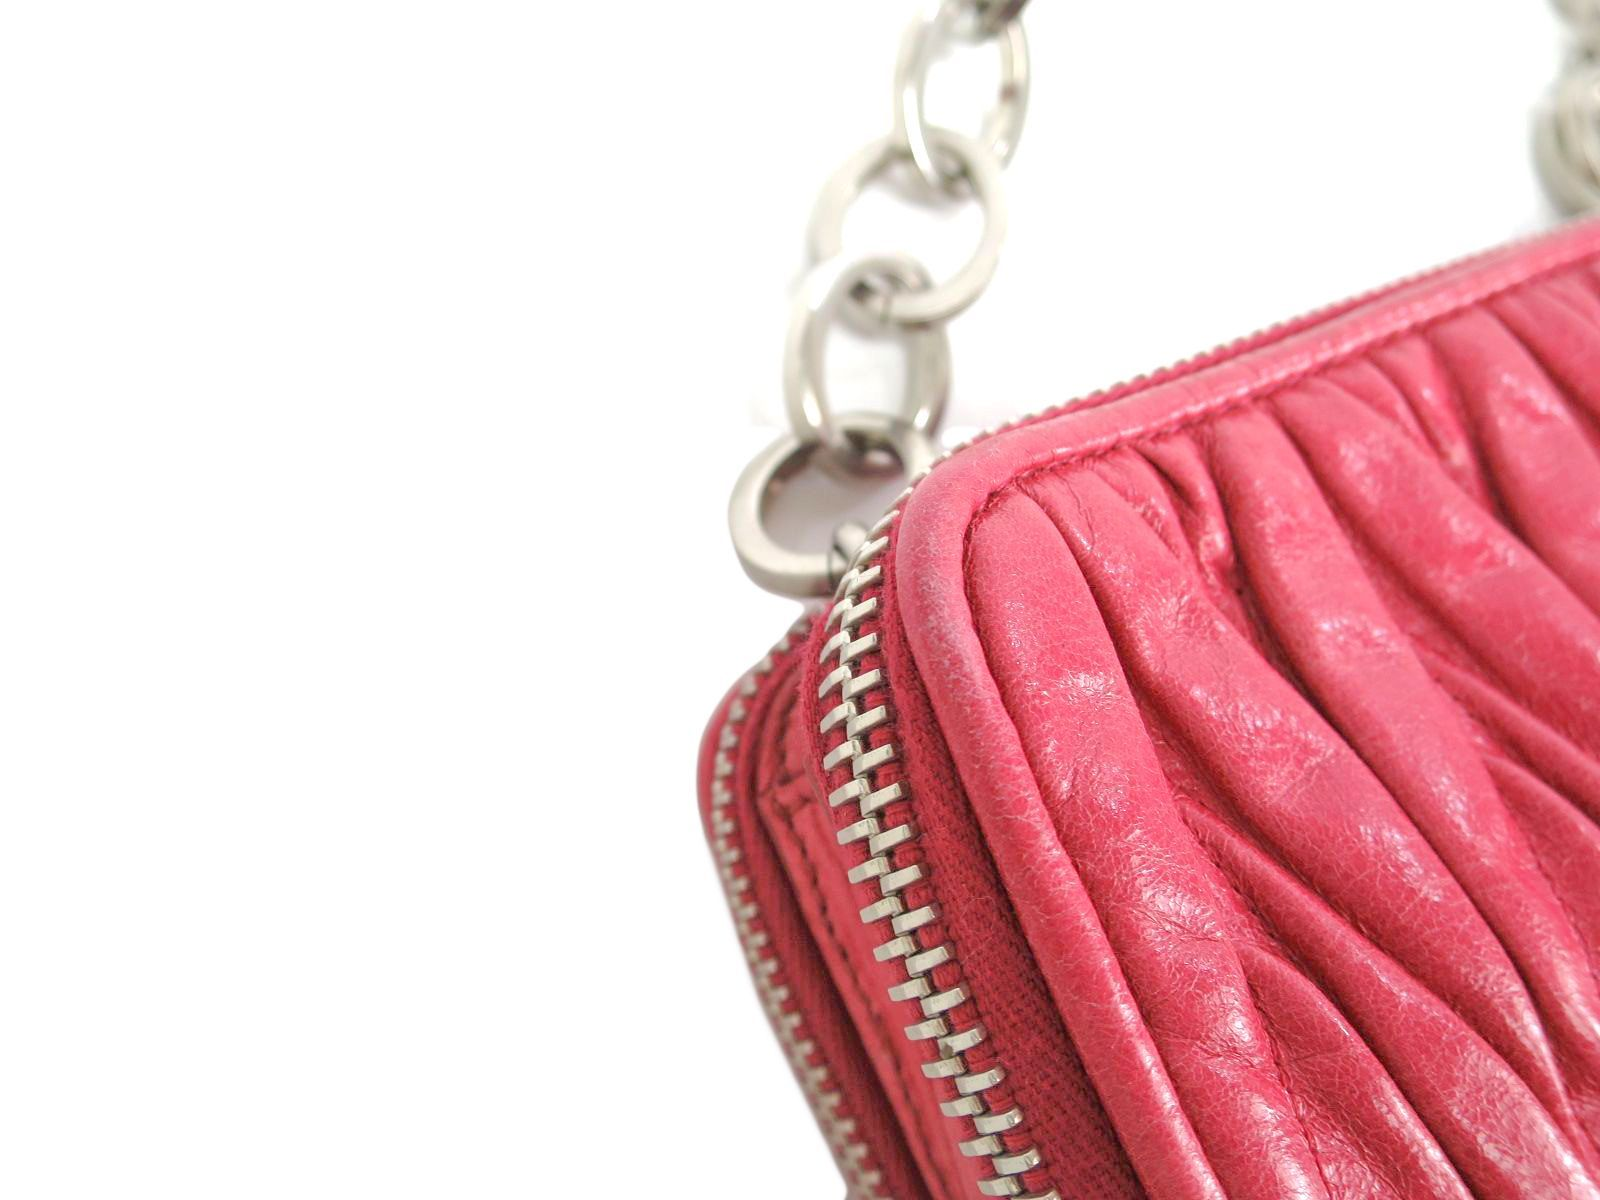 442d9dd8871b Miu Miu Materasse Chain Shoulder Bag MATELASSE  LUX PEONIA RT 0531 ...